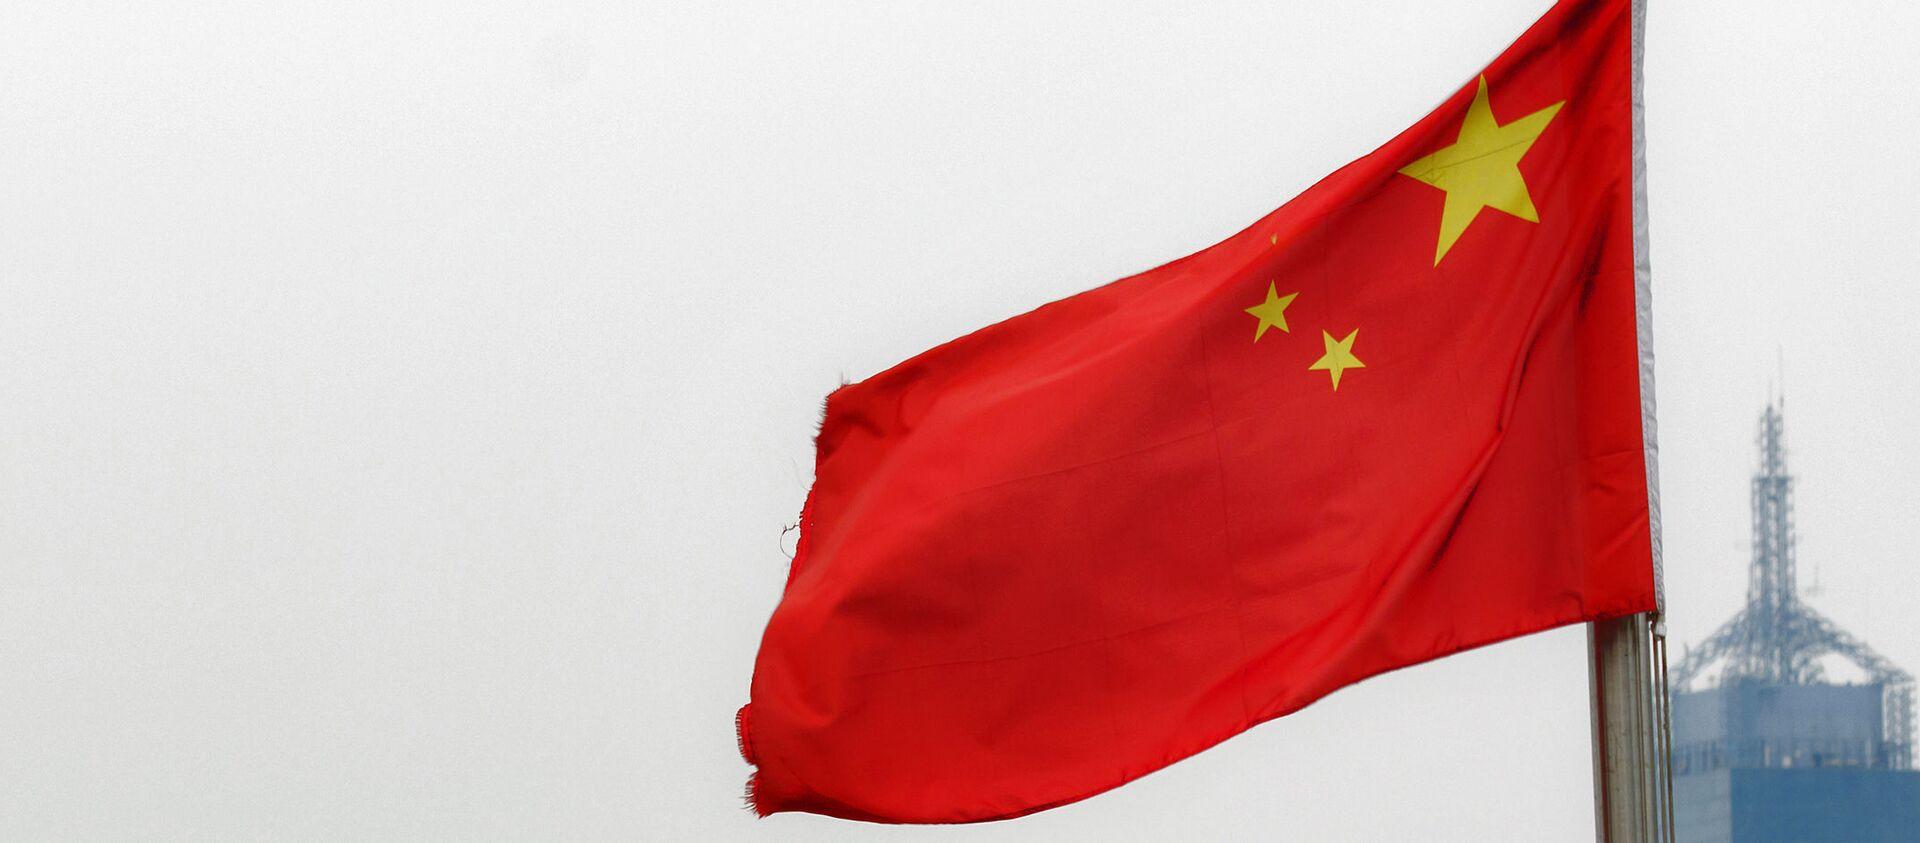 Quốc kỳ Trung Quốc - Sputnik Việt Nam, 1920, 17.09.2021